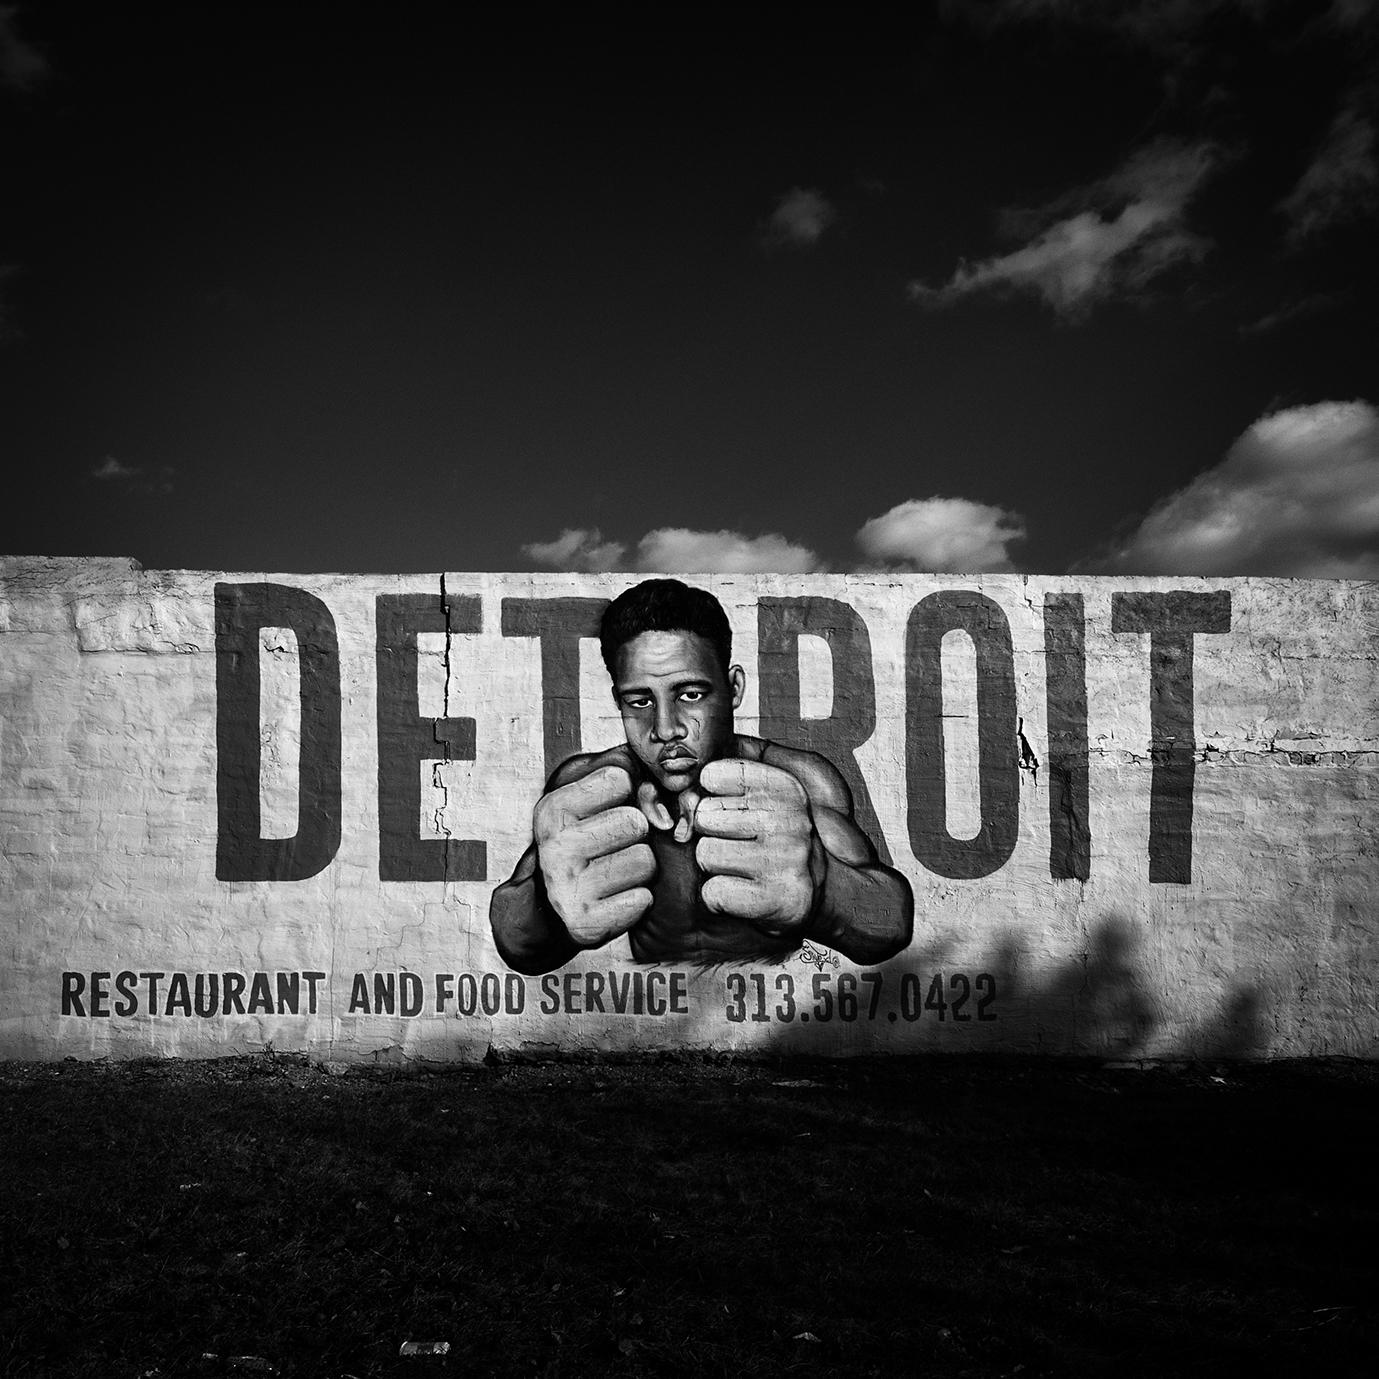 Joe Louis Mural by Sintex, Detroit, 2014